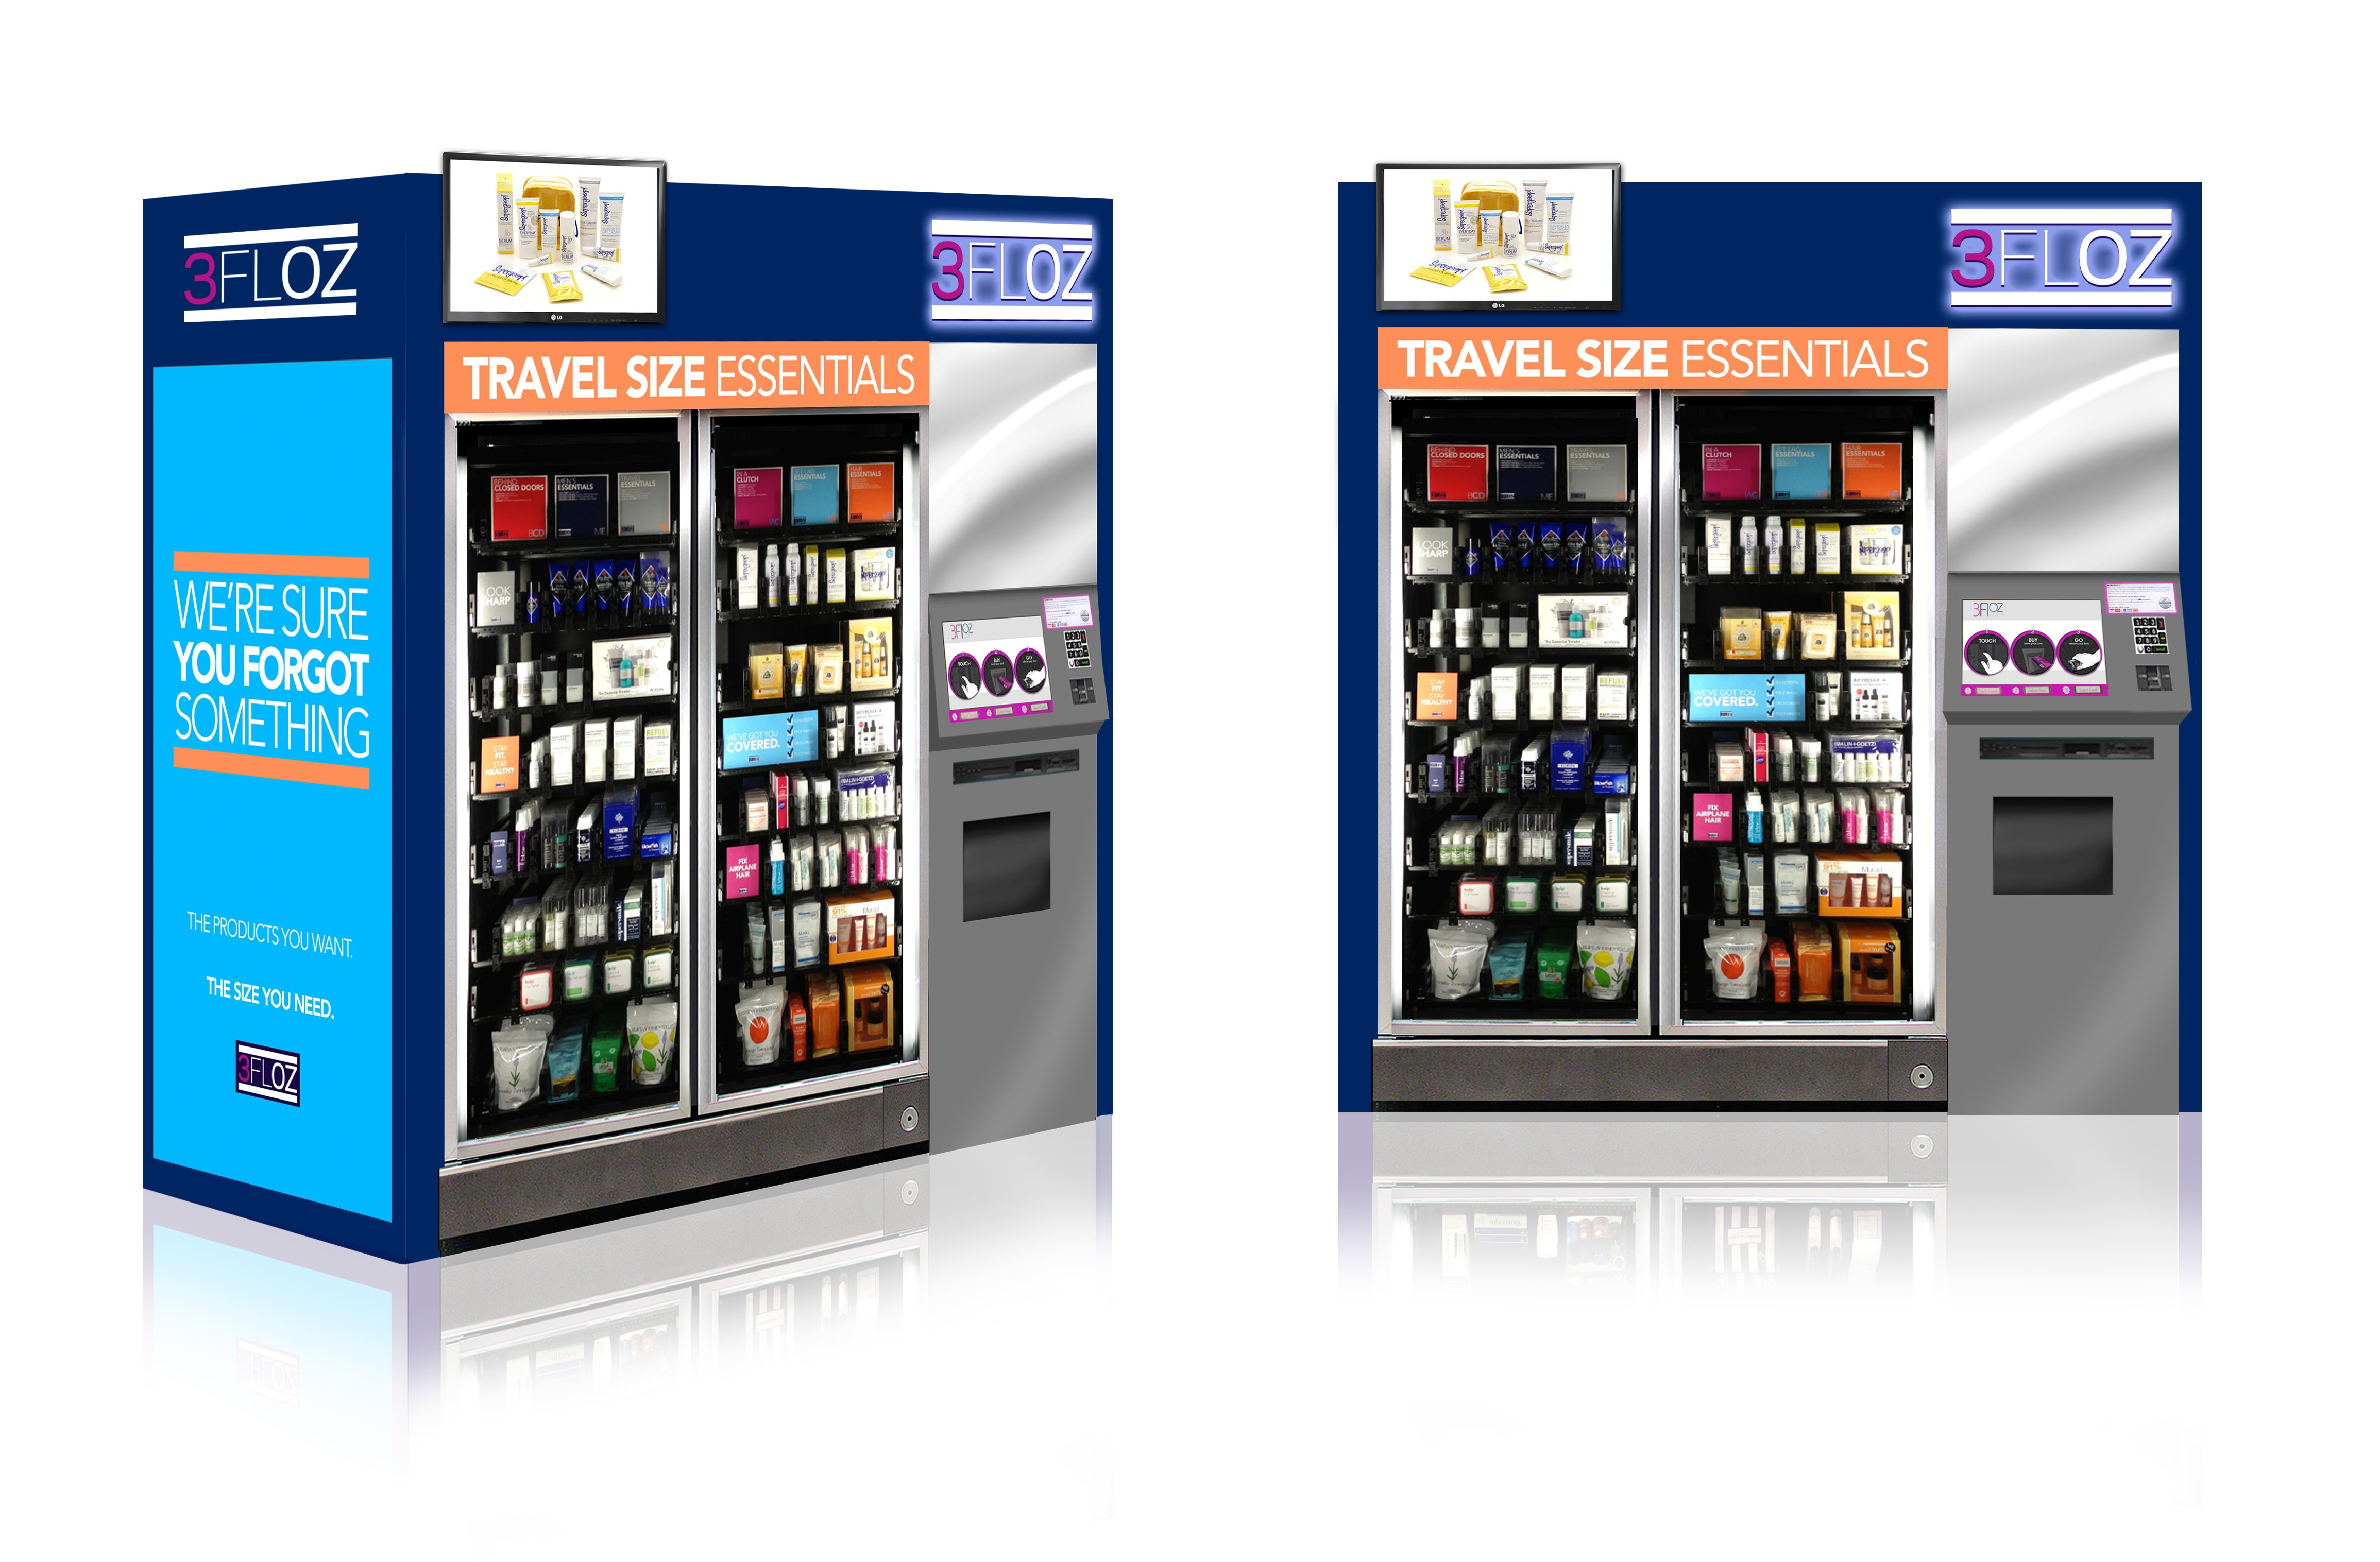 3FLOZ Vending Machine